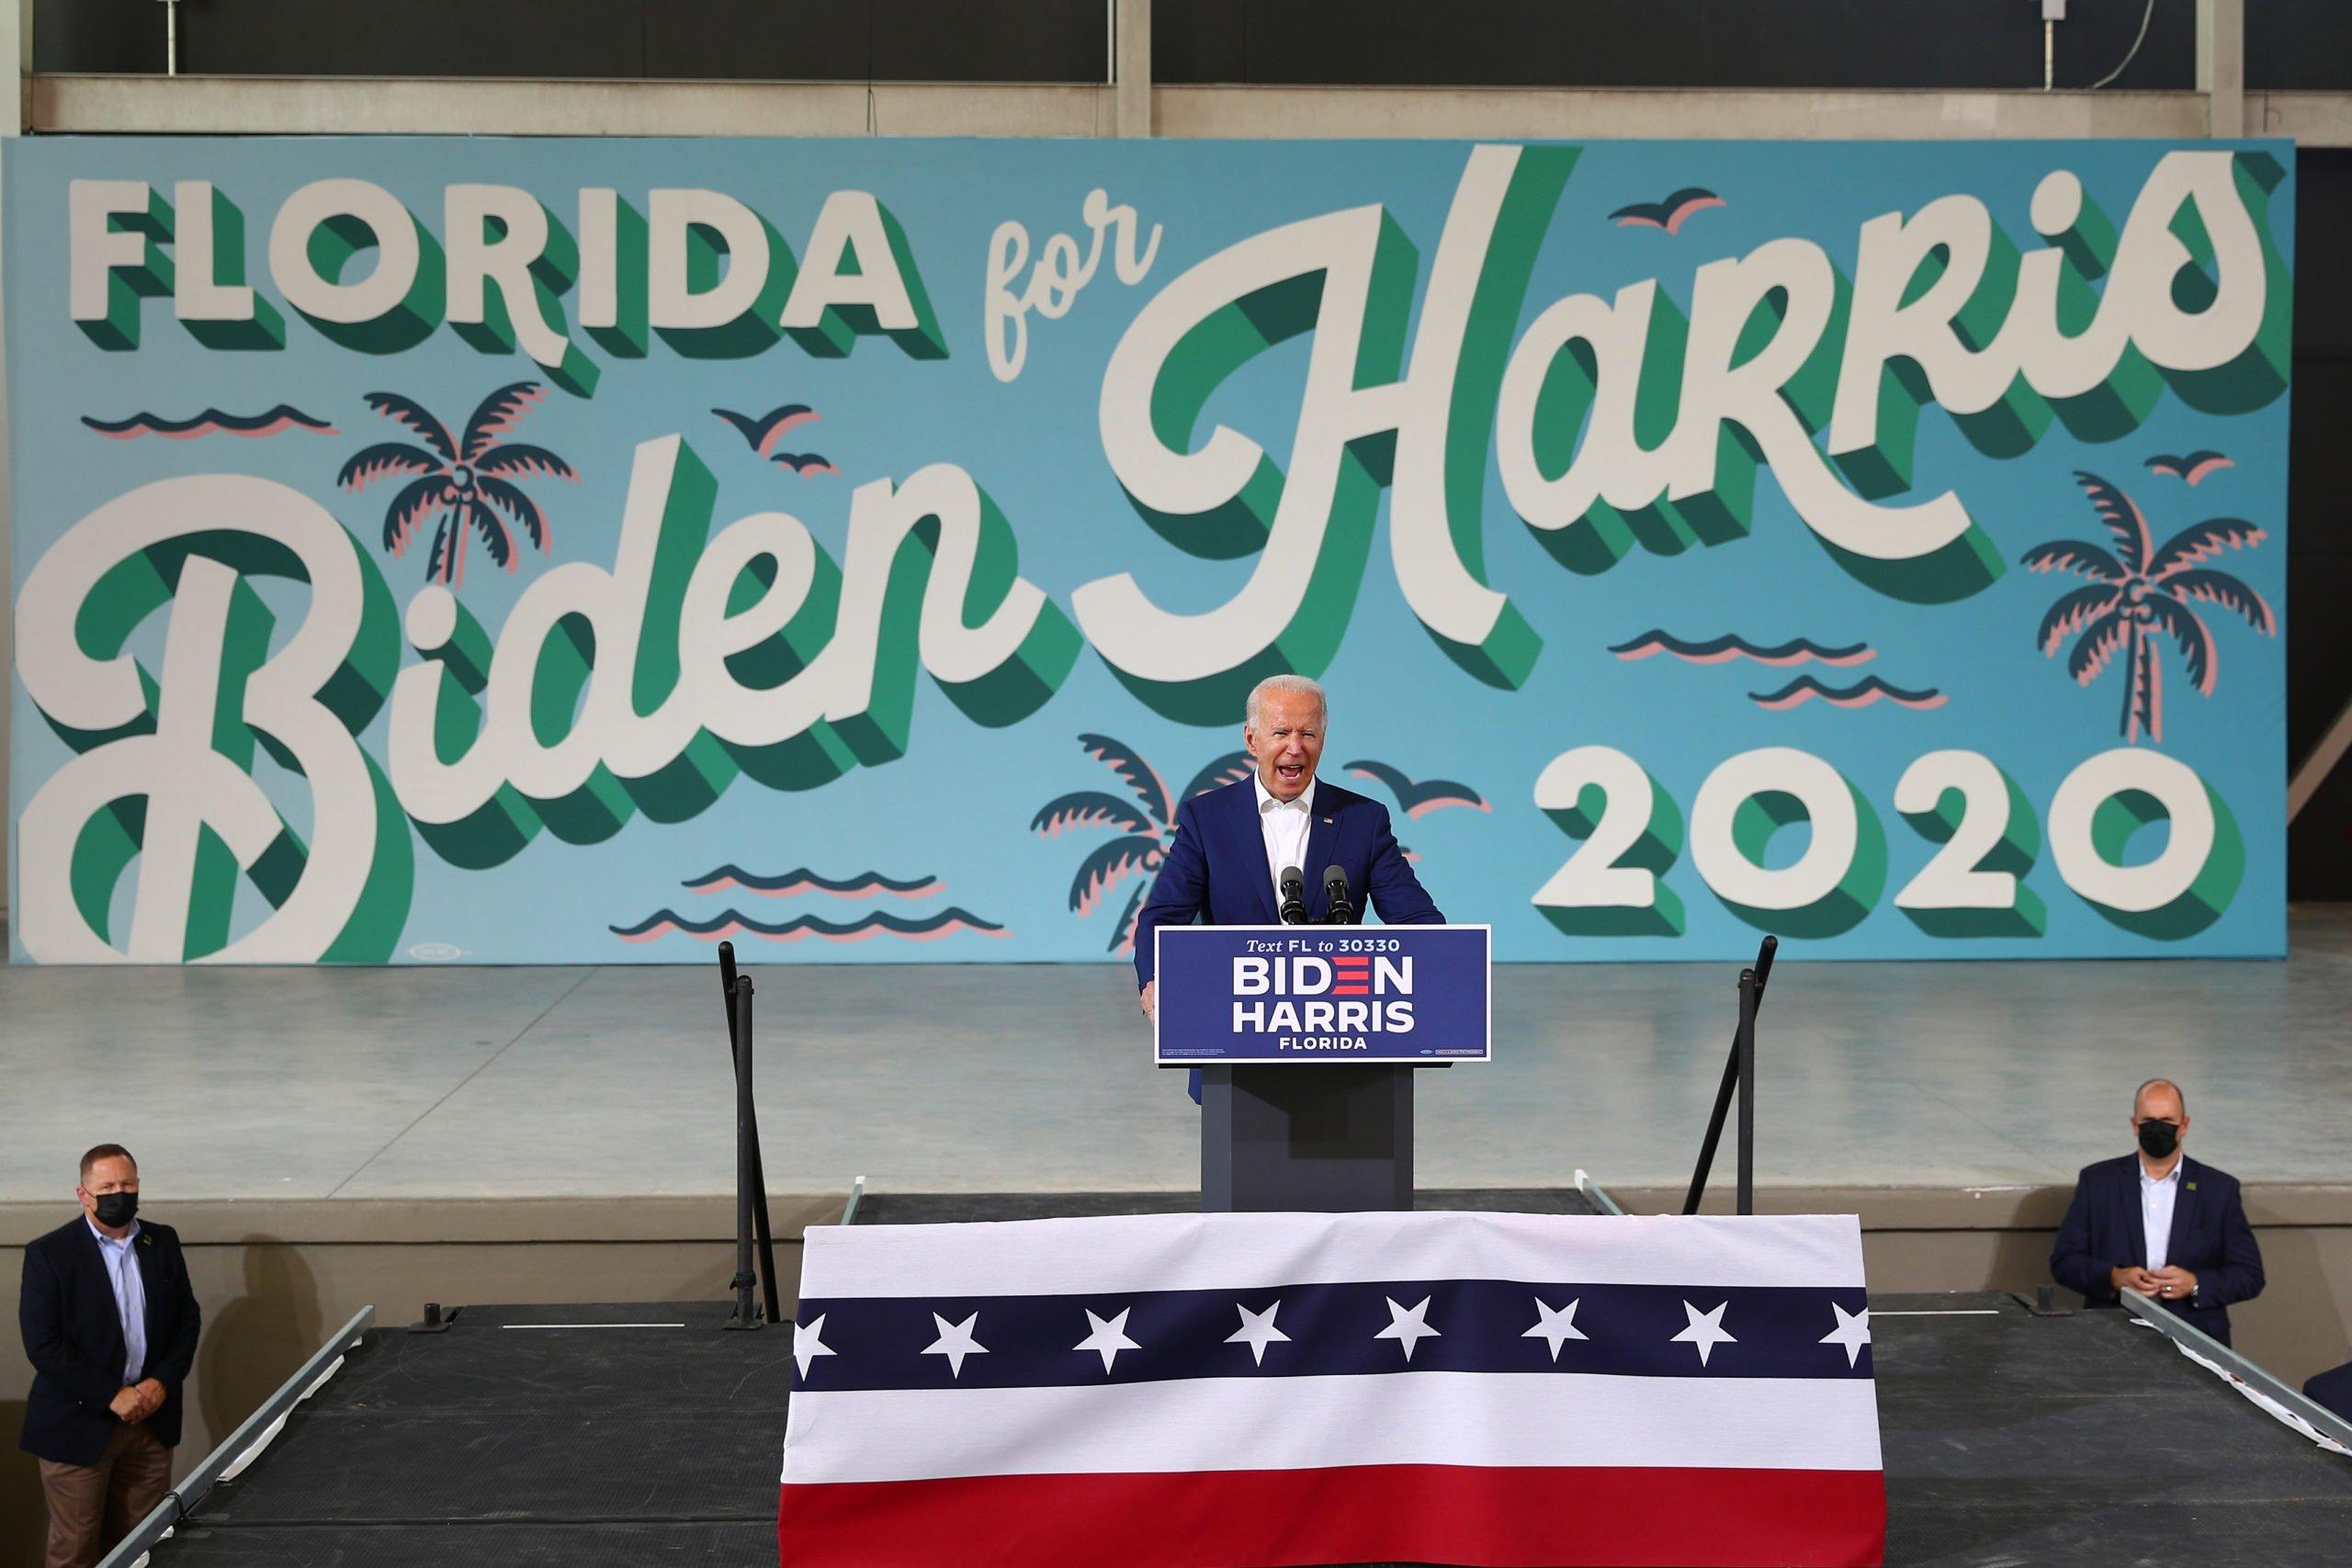 U.S. Democratic presidential candidate Joe Biden delivers remarks during a voter mobilization event, at Miramar Regional Park in Miramar, Florida, U.S., October 13, 2020. REUTERS/Tom Brenner